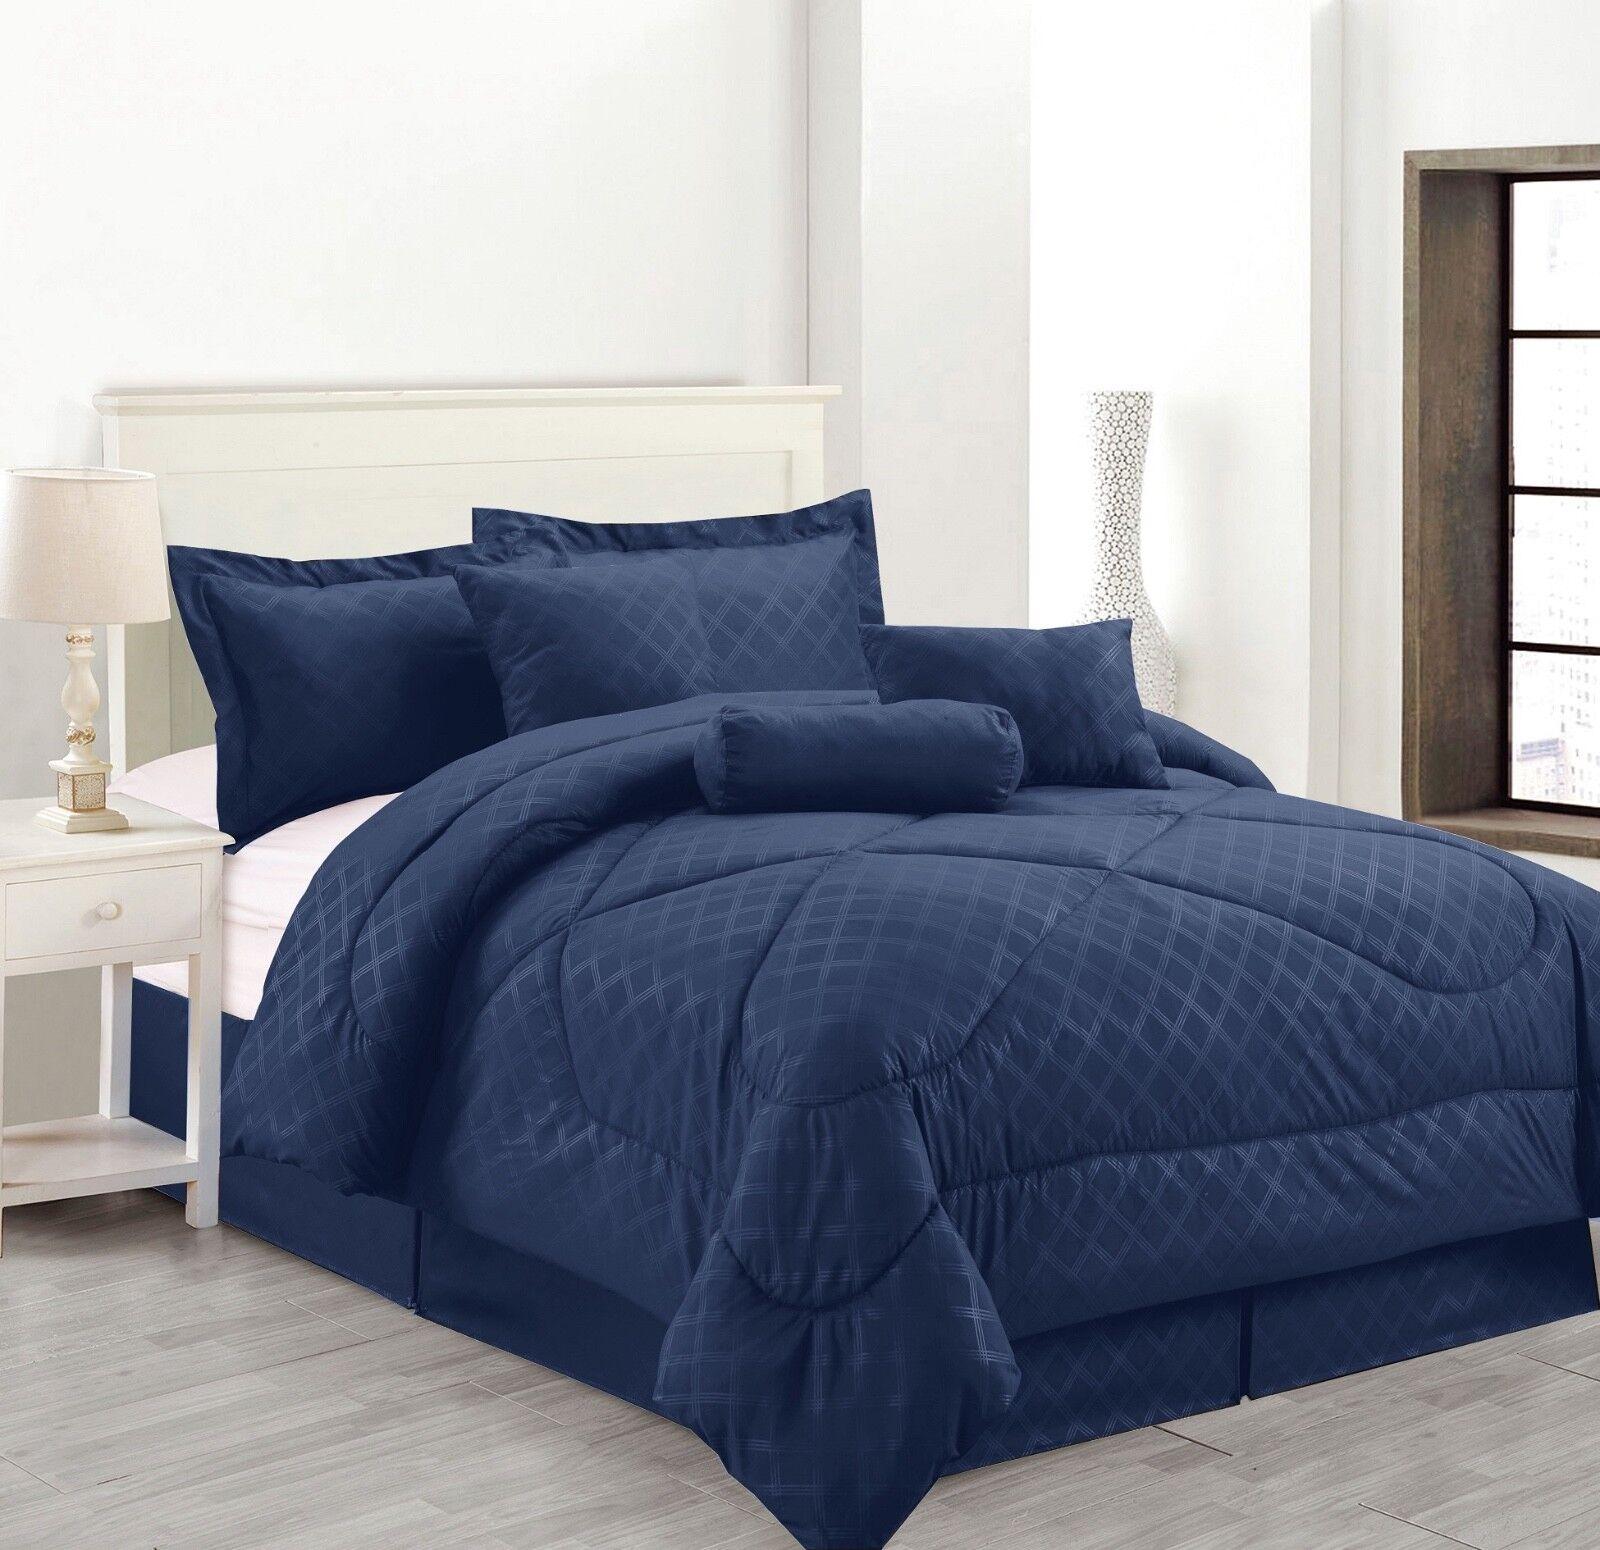 7 Piece Solid Luxury Hotel Comforter Set Bed In A bag All Größes - Navy Blau